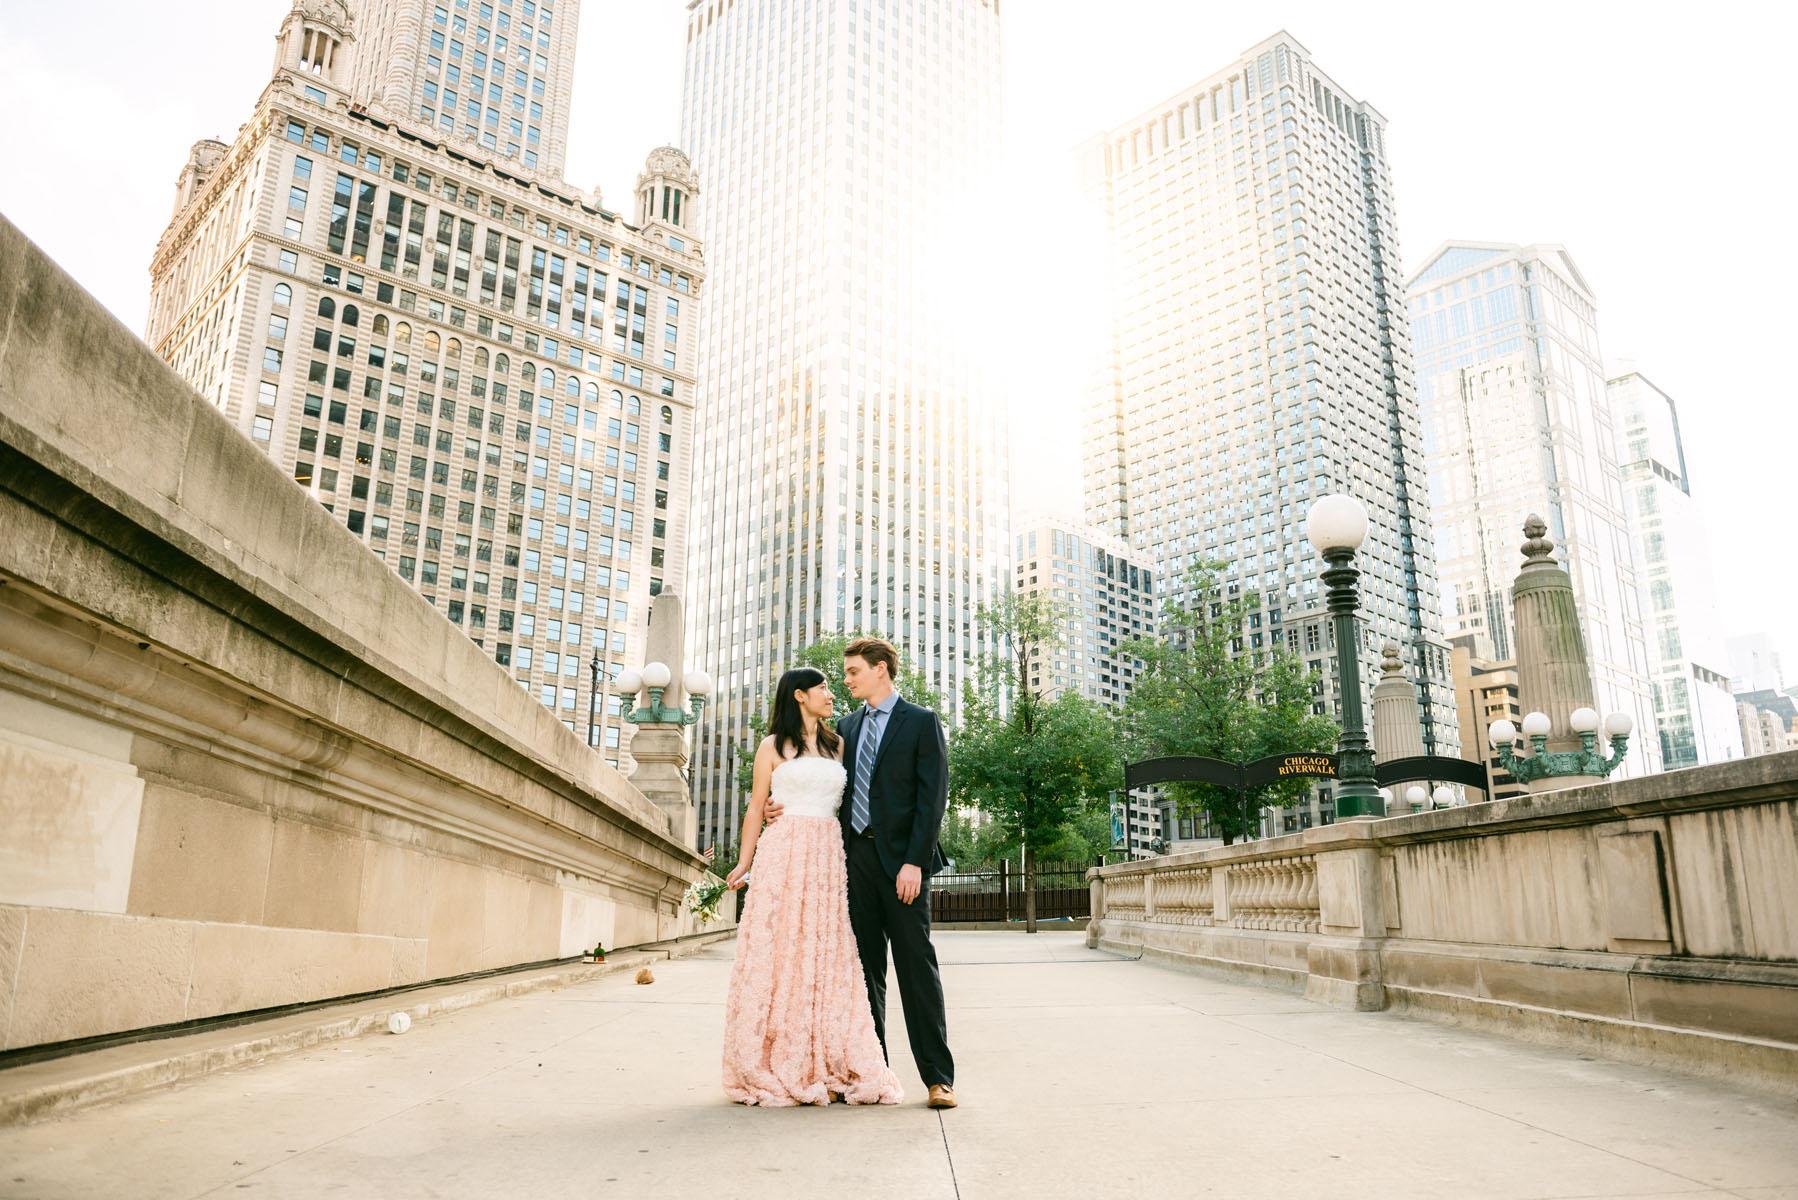 Michigan Avenue Engagement Photo